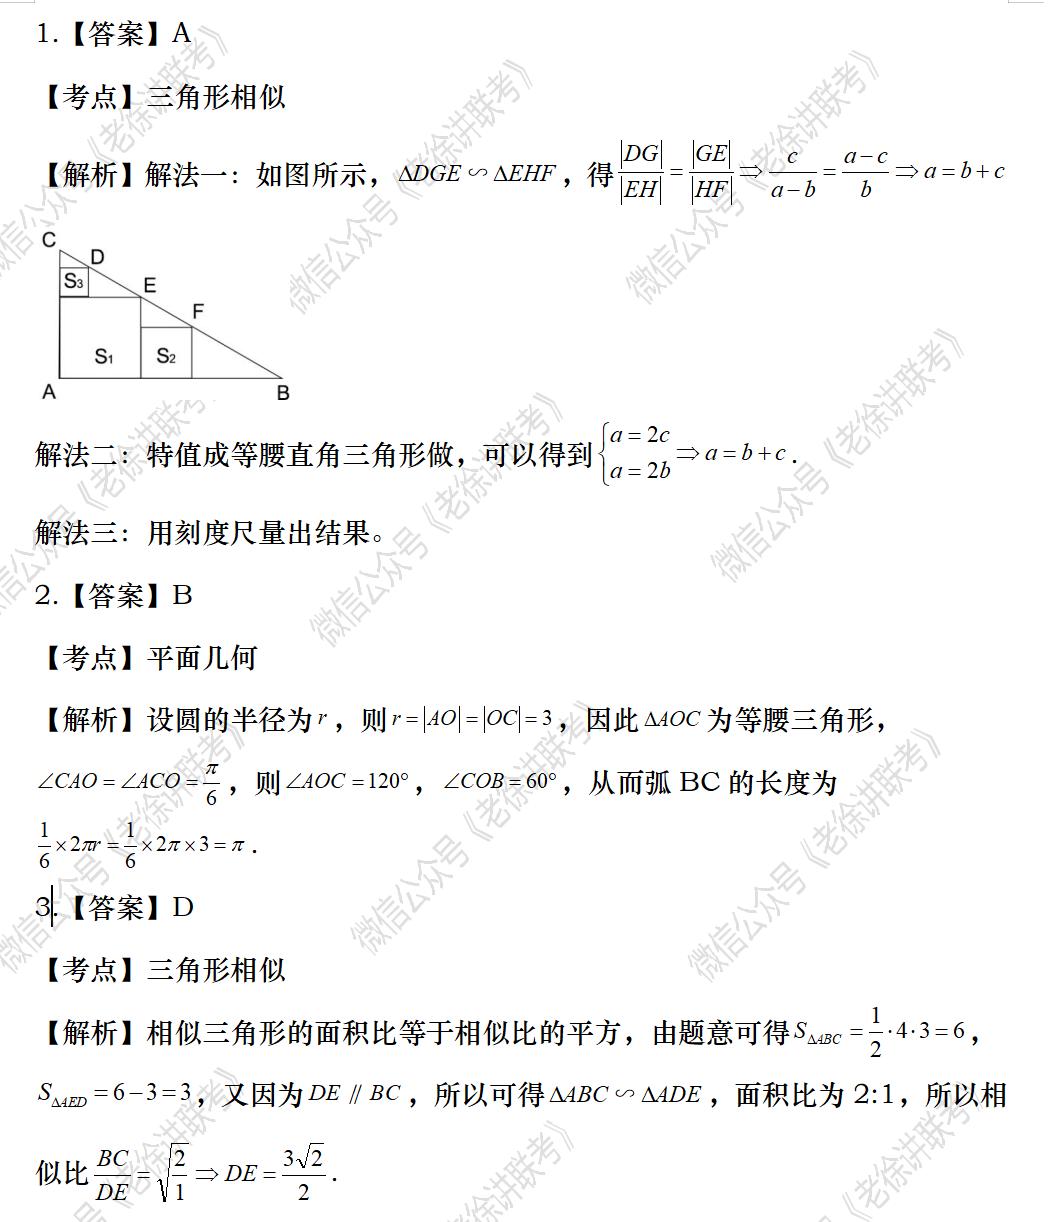 2022MBA考研|管理类联考:数学专题训练-线段的长度问题(第三期)